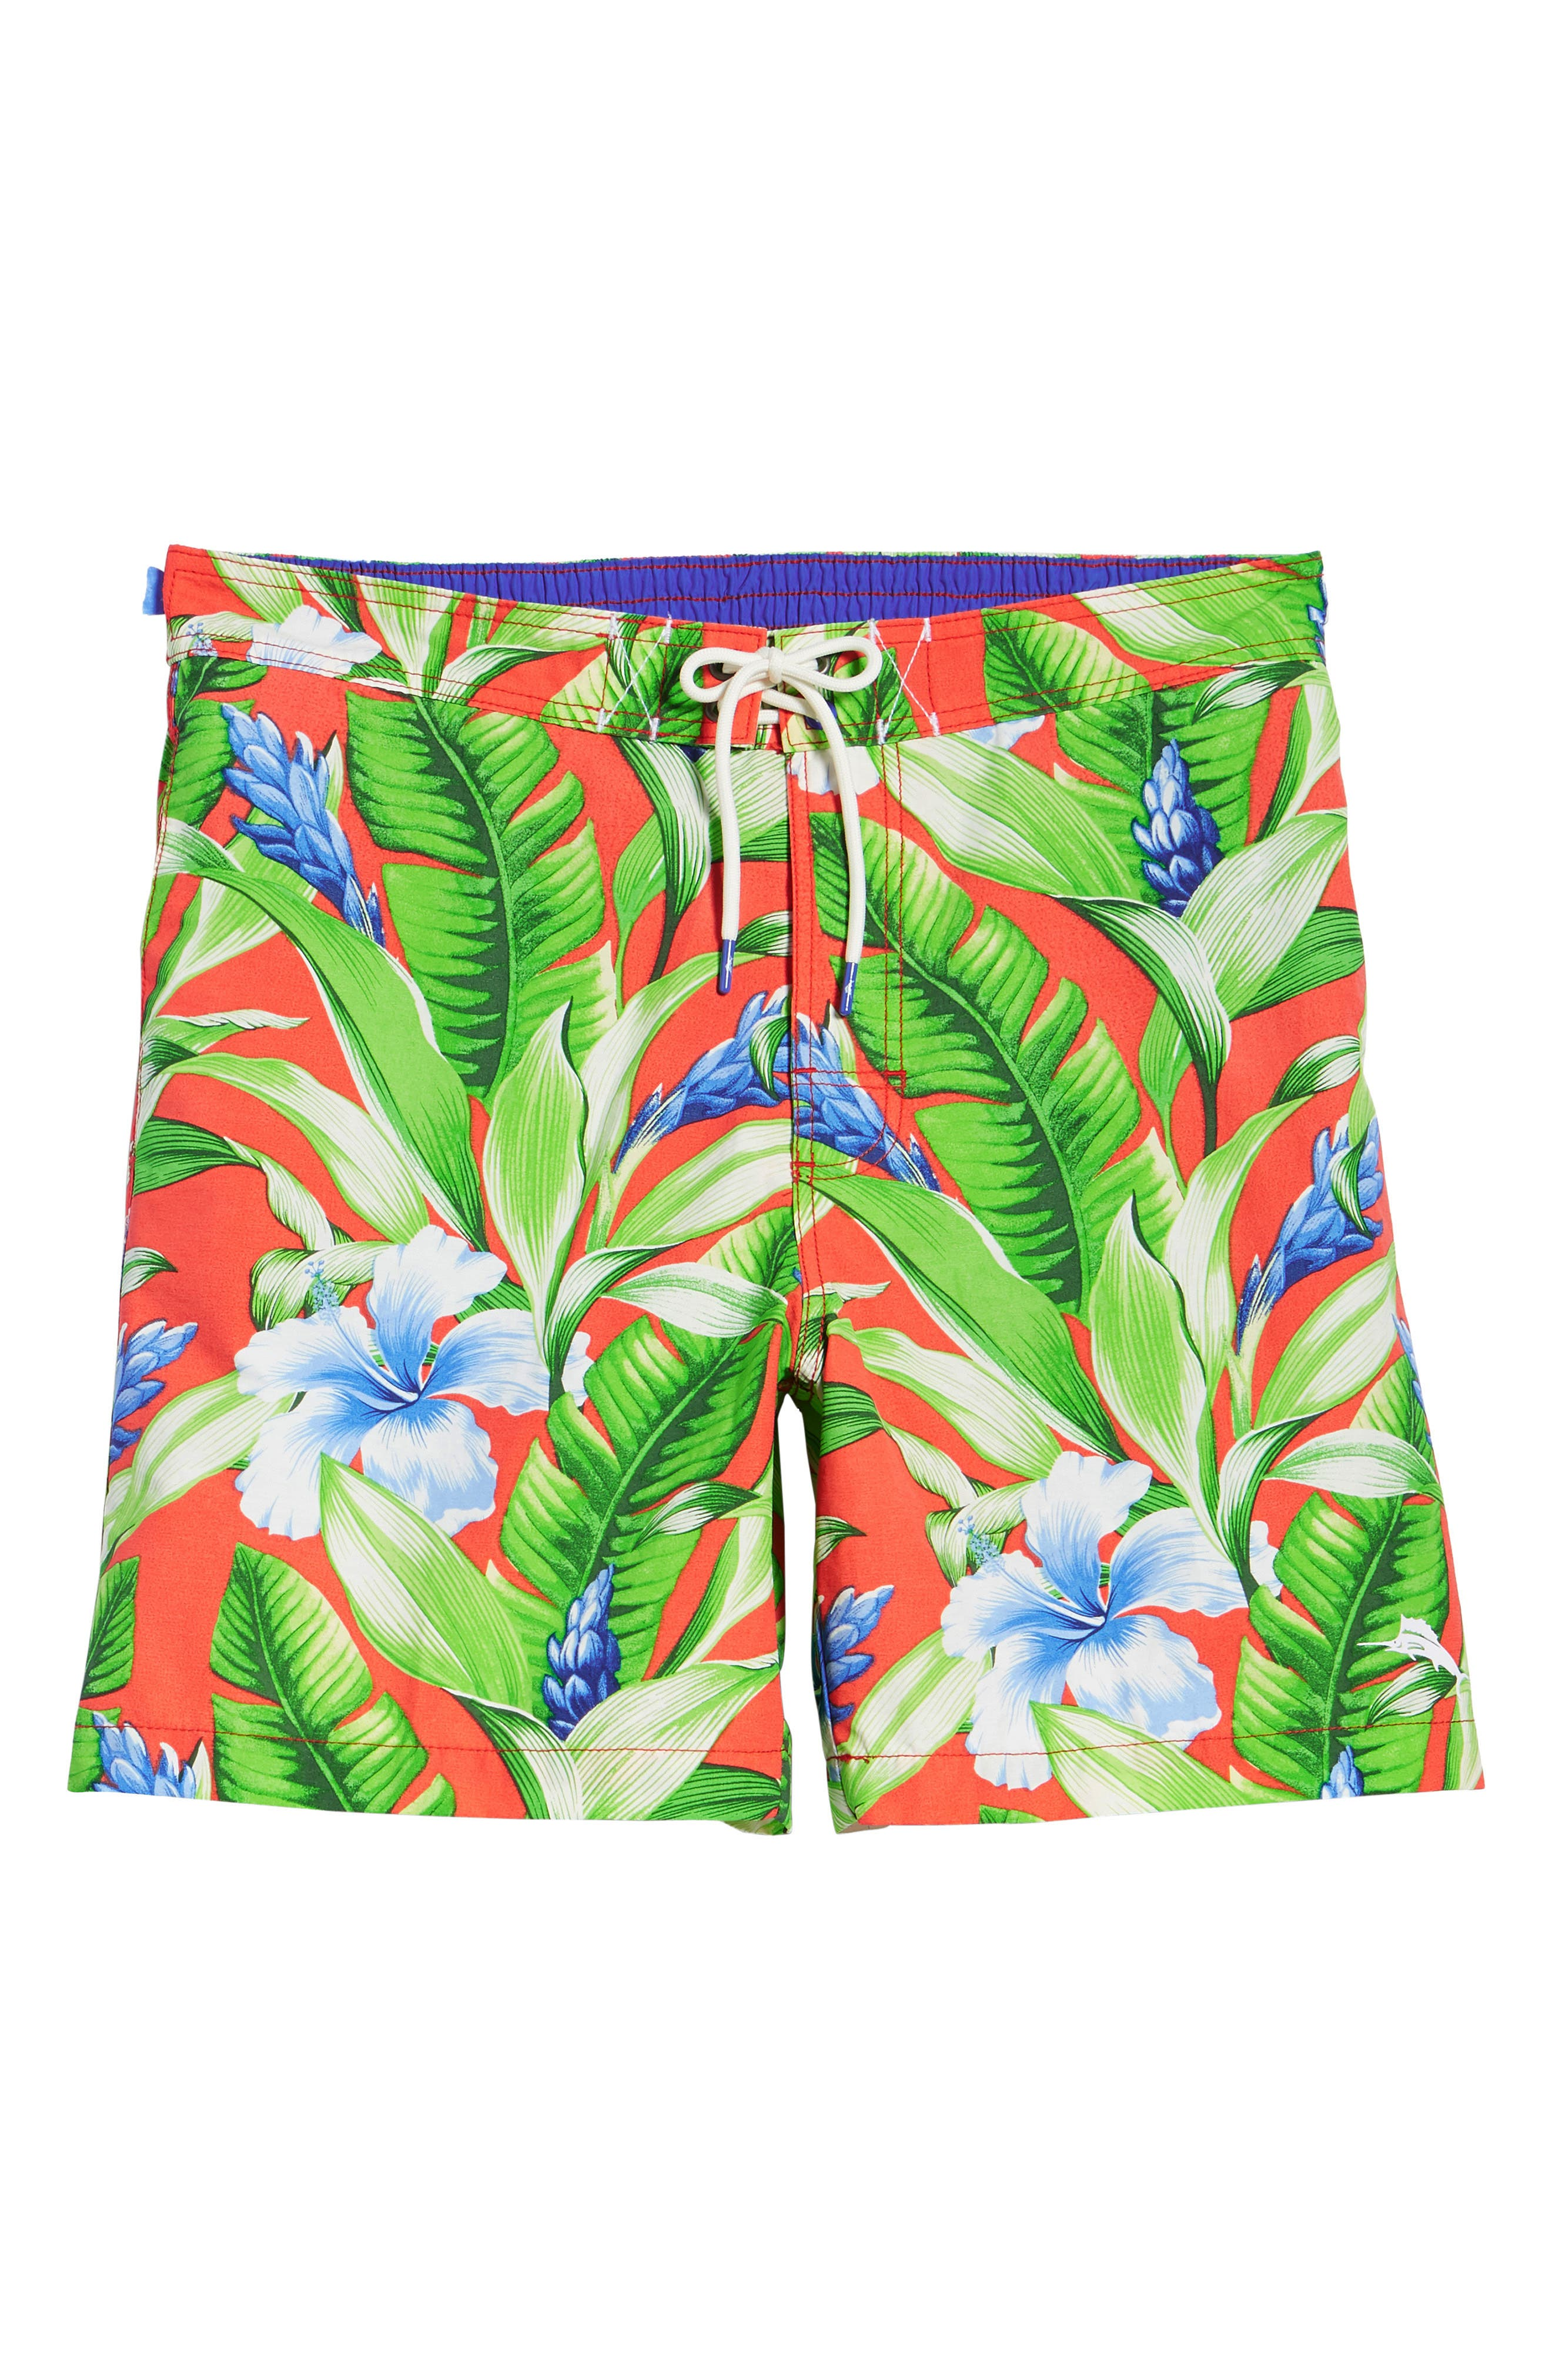 Baja Tulum Bloom Board Shorts,                             Alternate thumbnail 6, color,                             Fire Orange